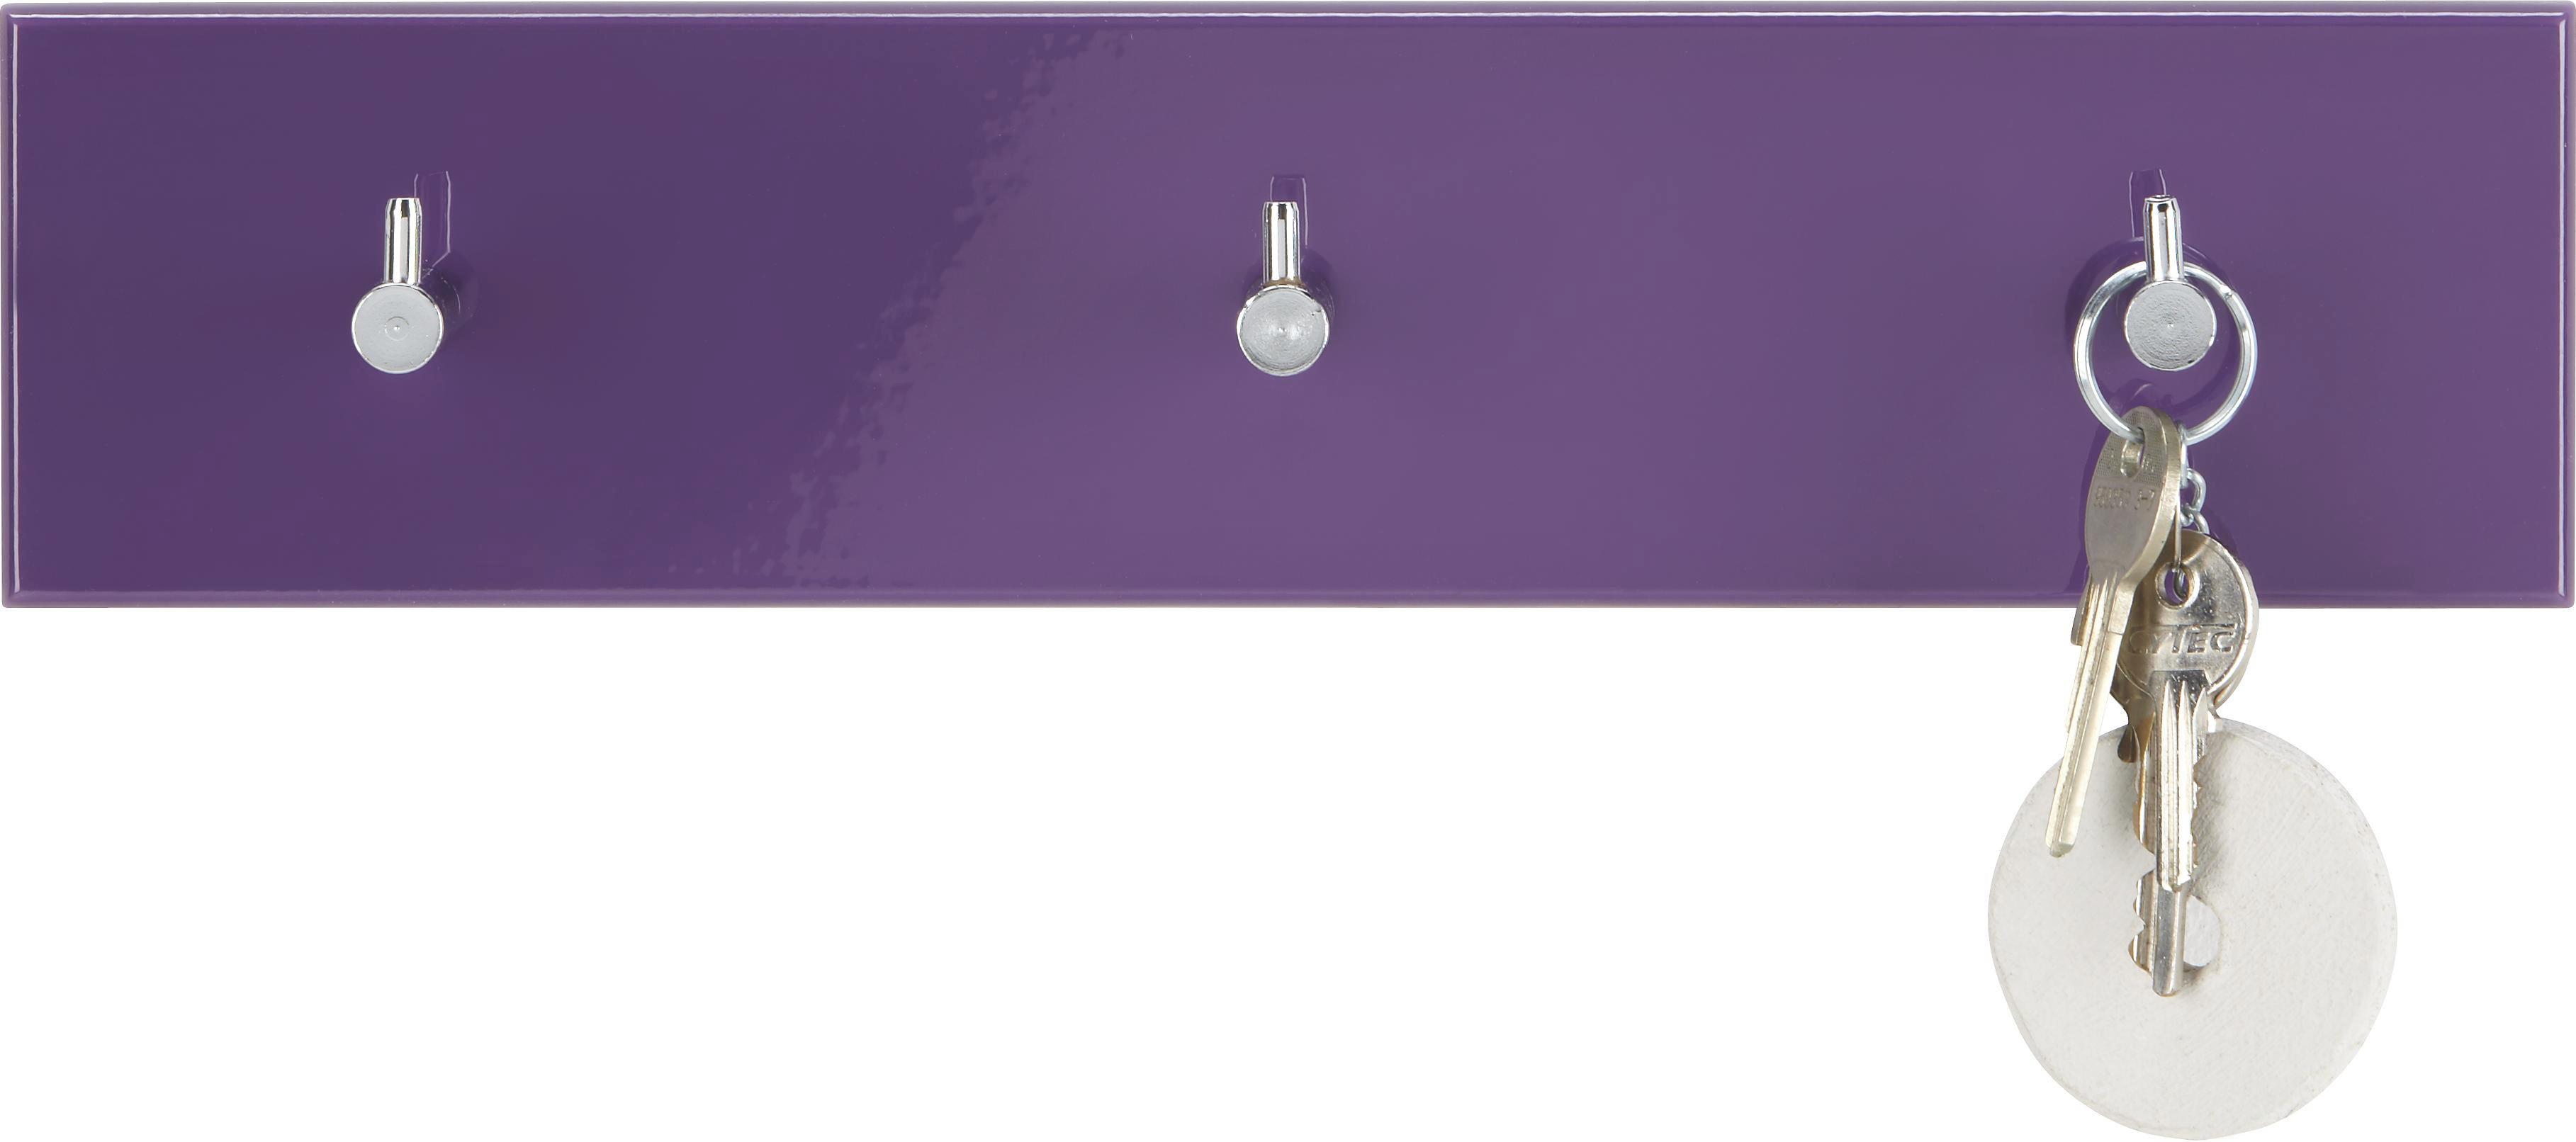 GARDEROBA ZIDNA - boje kroma/kupina, Design, drvo/metal (34/5/8cm) - BOXXX